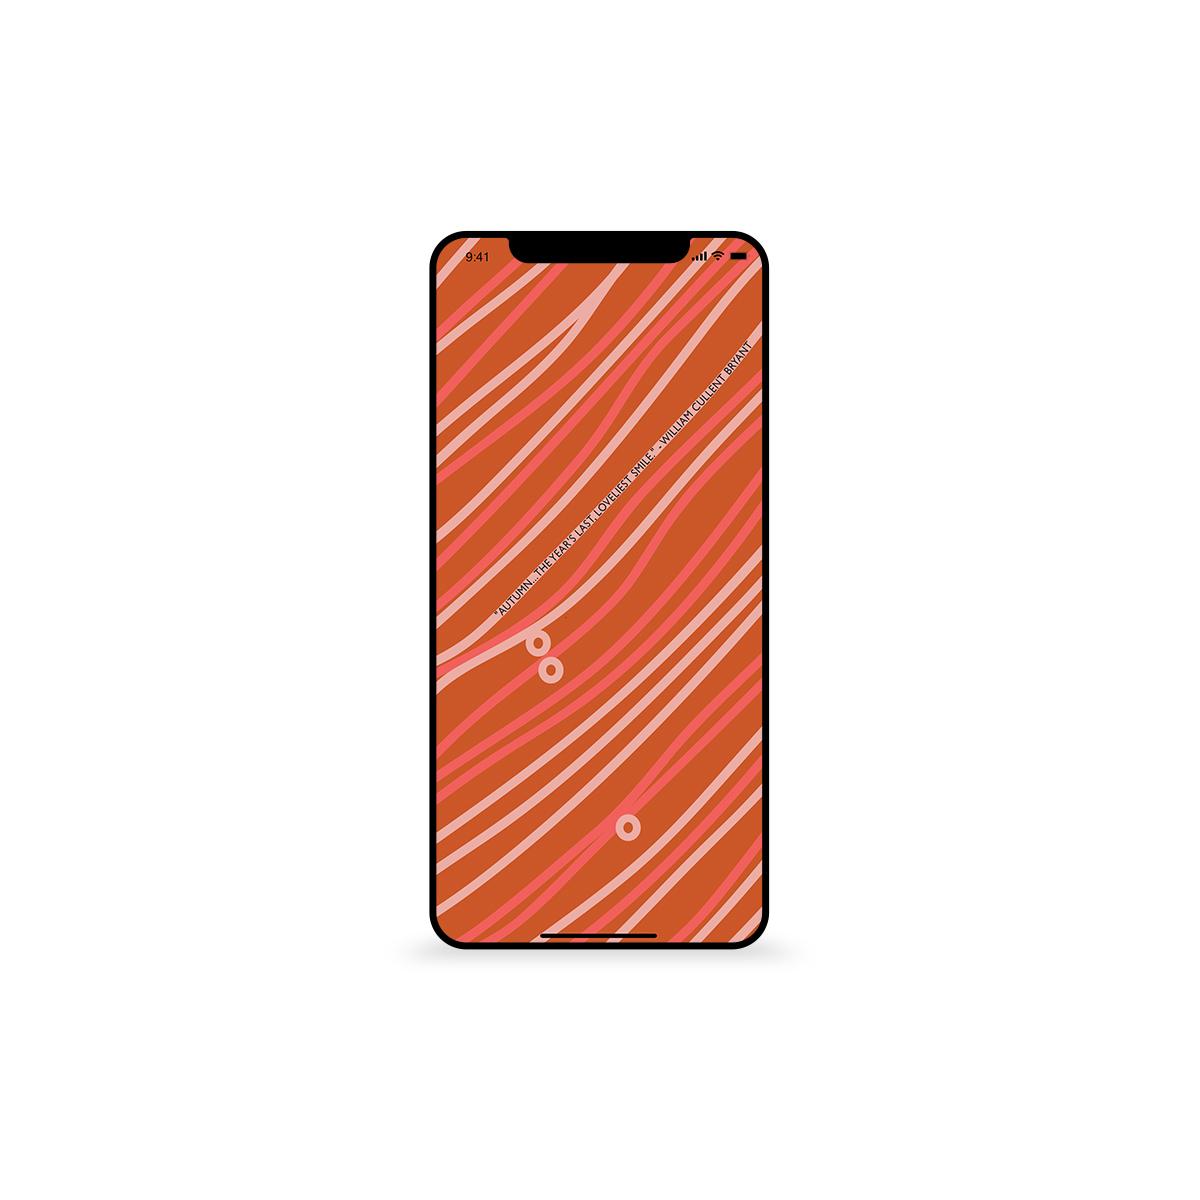 iphone_mockup_SINGLEIPHONESQUARE_linesAUTUMNwallpaper.jpg